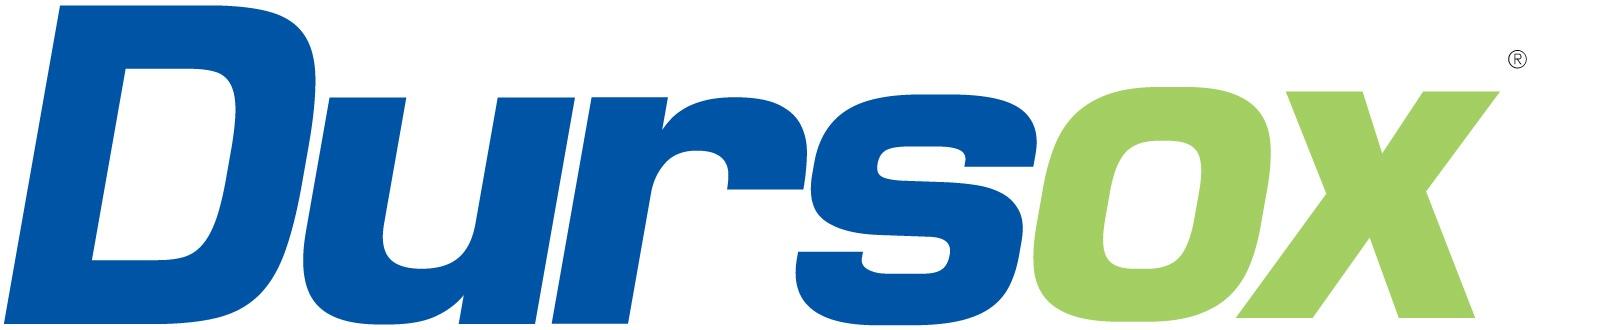 Dursox-logo registered TM